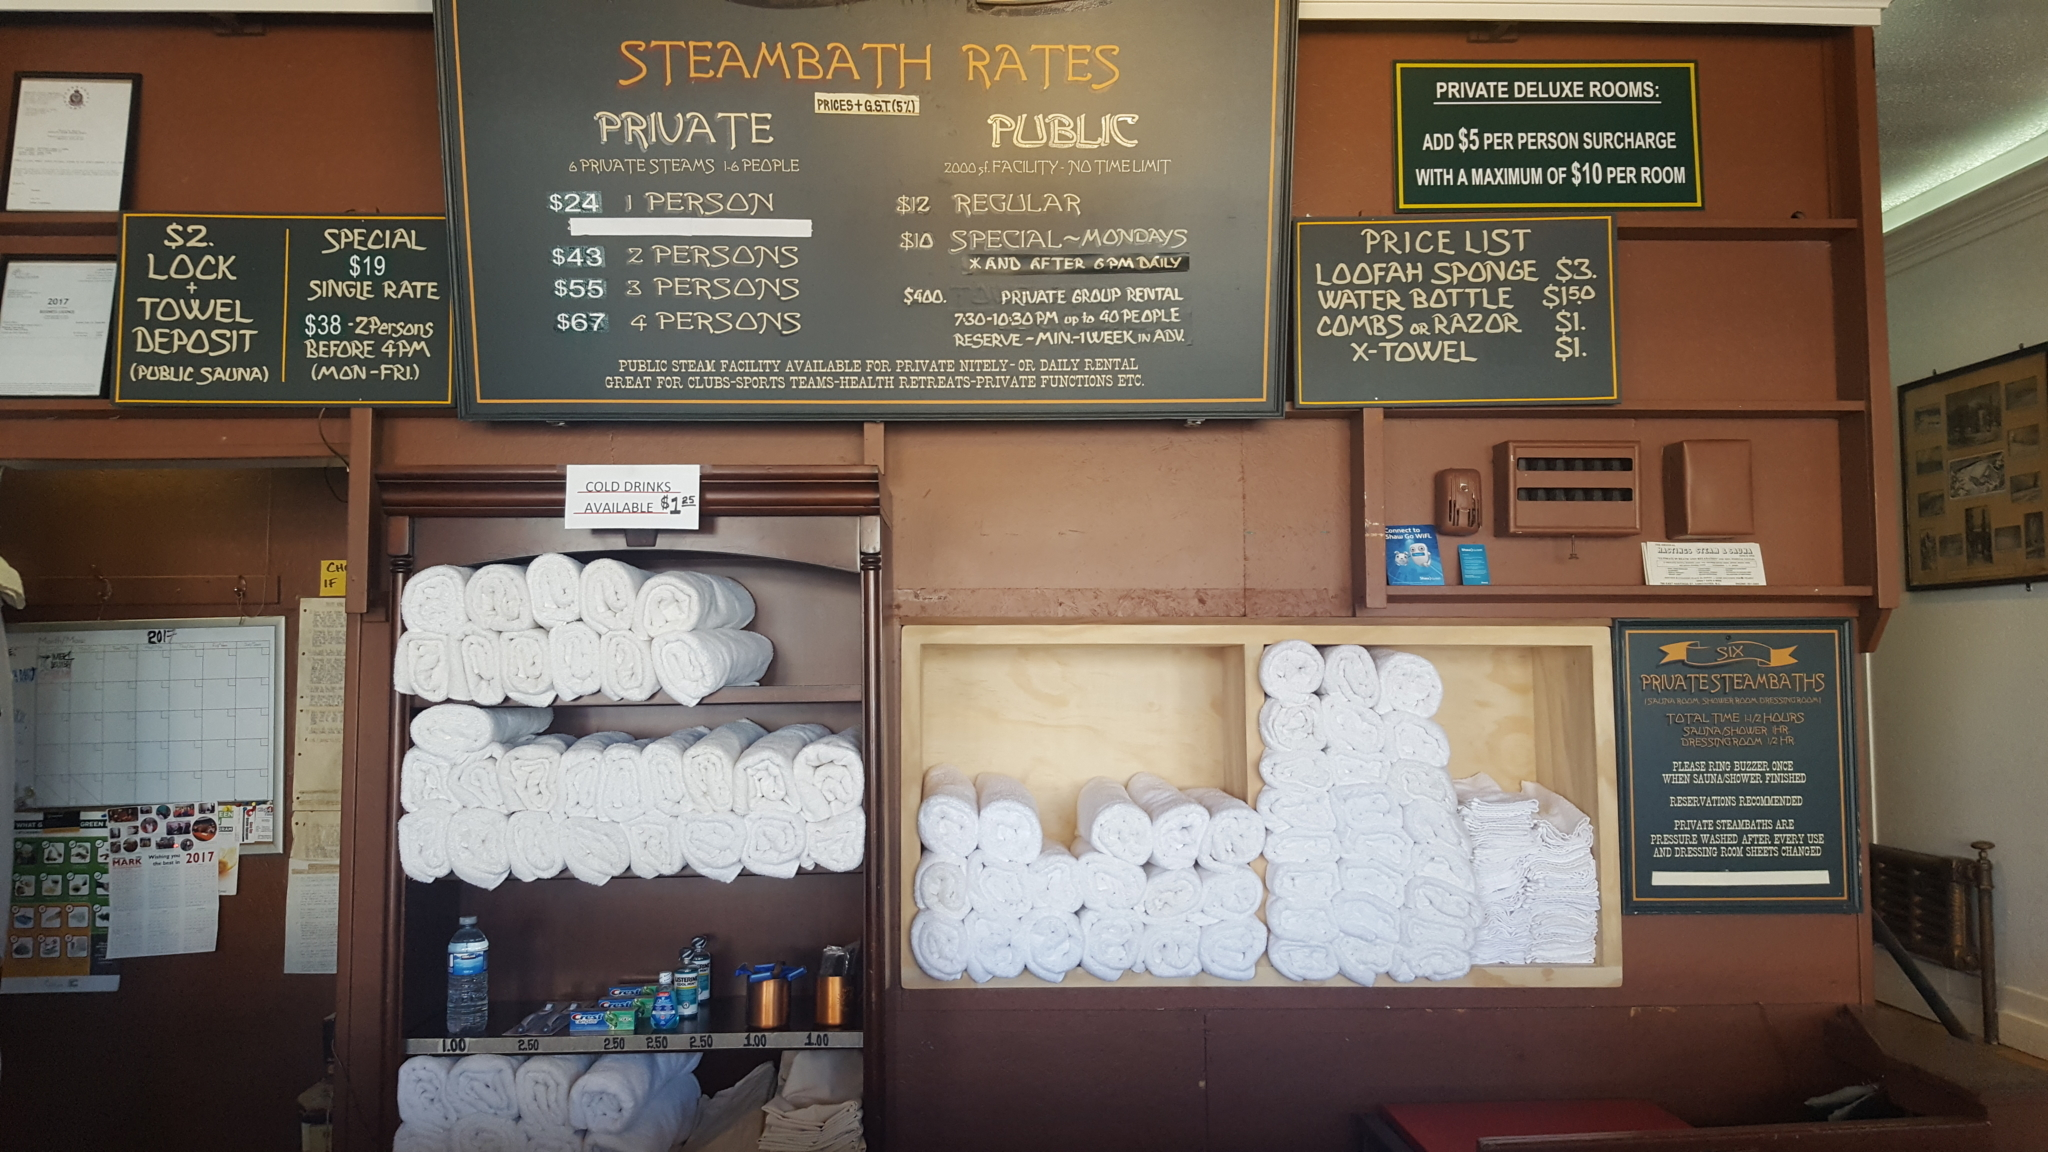 Hastings Steam & Sauna